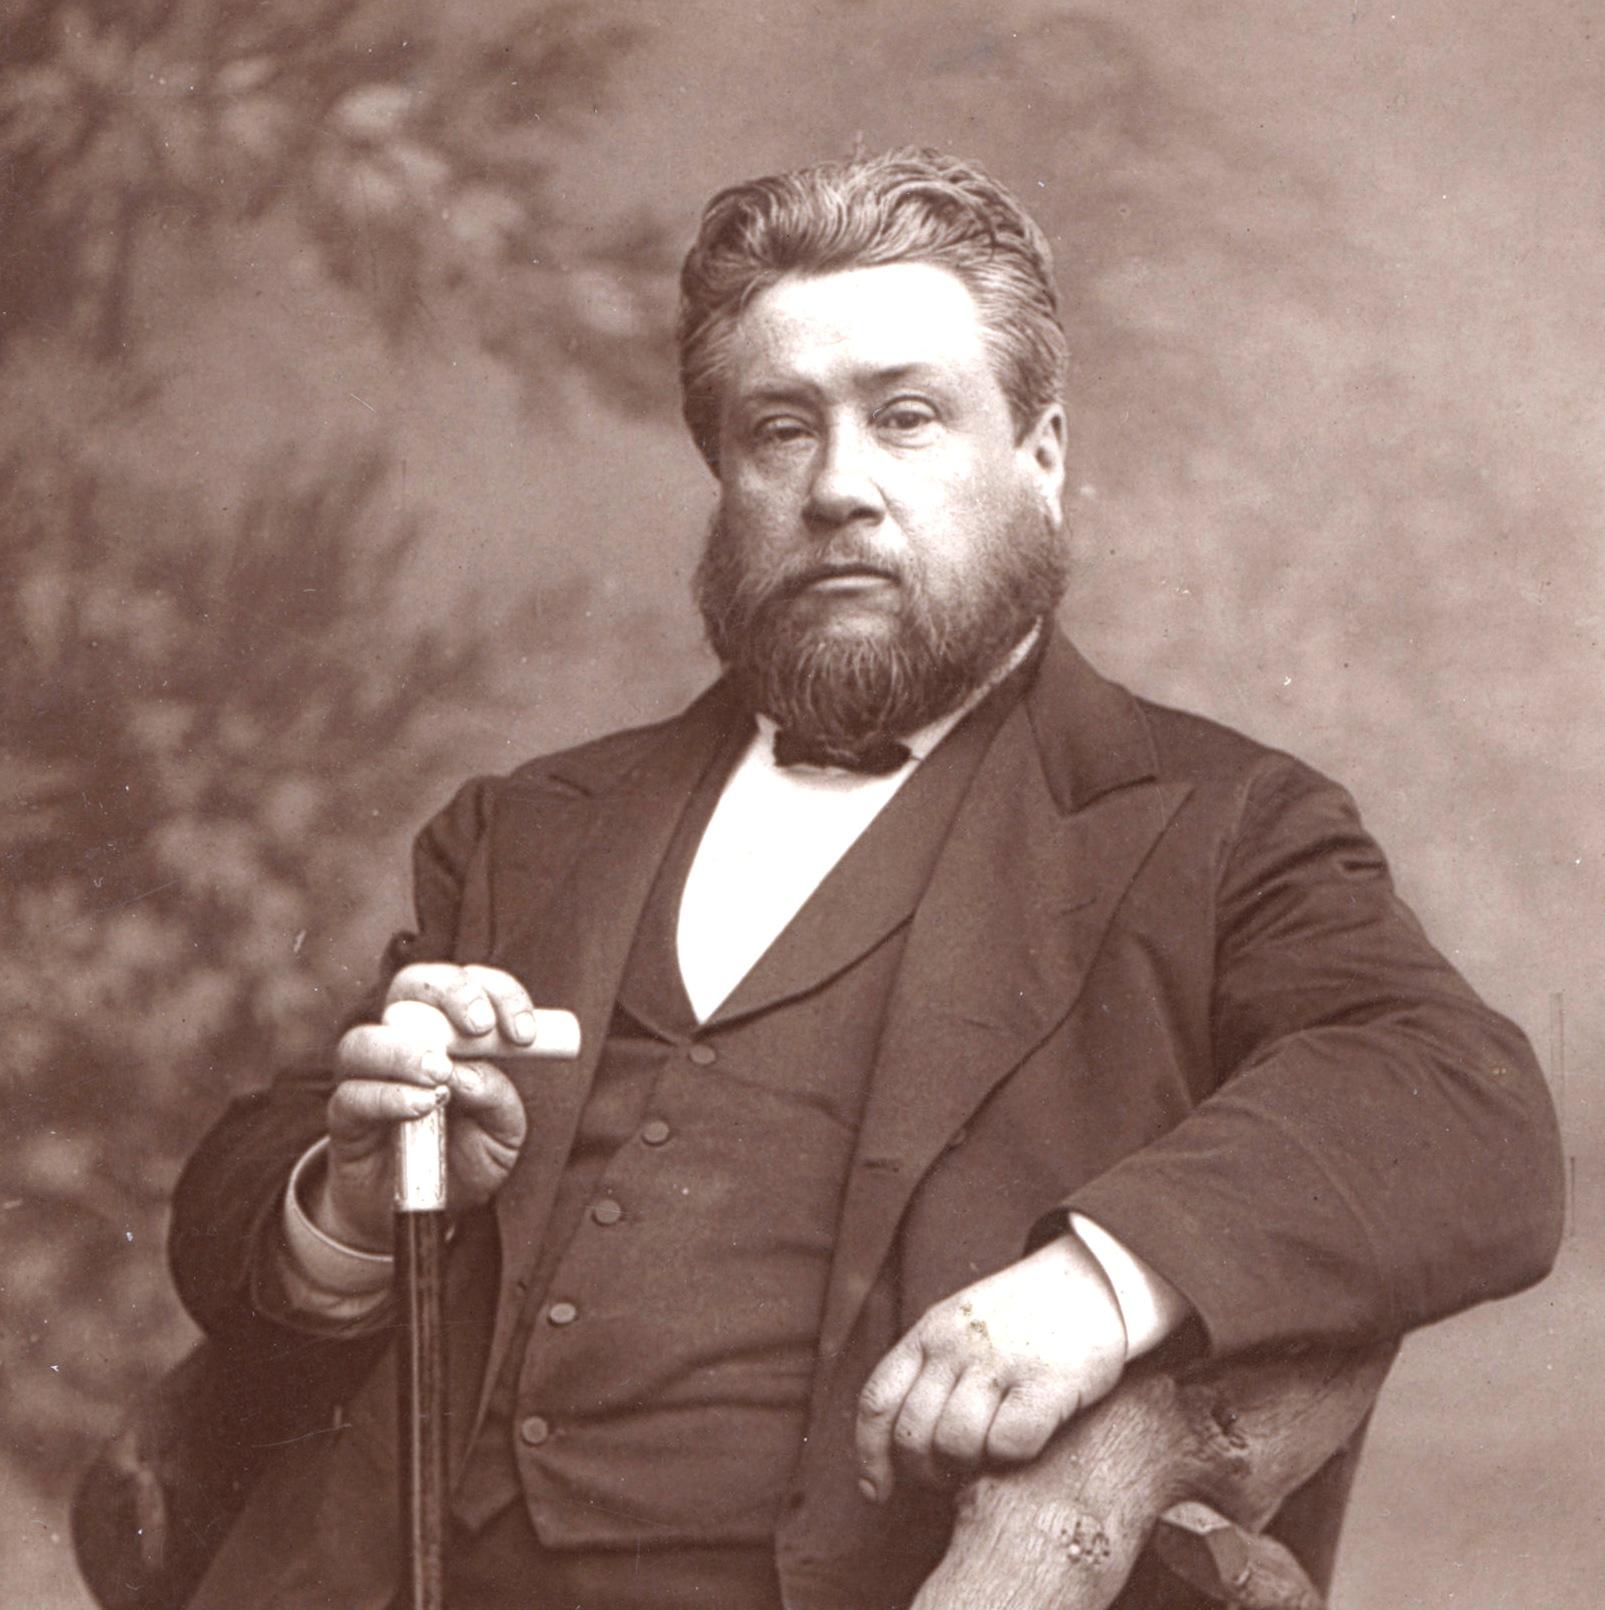 Preacher Charles Spurgeon (1834-1892)